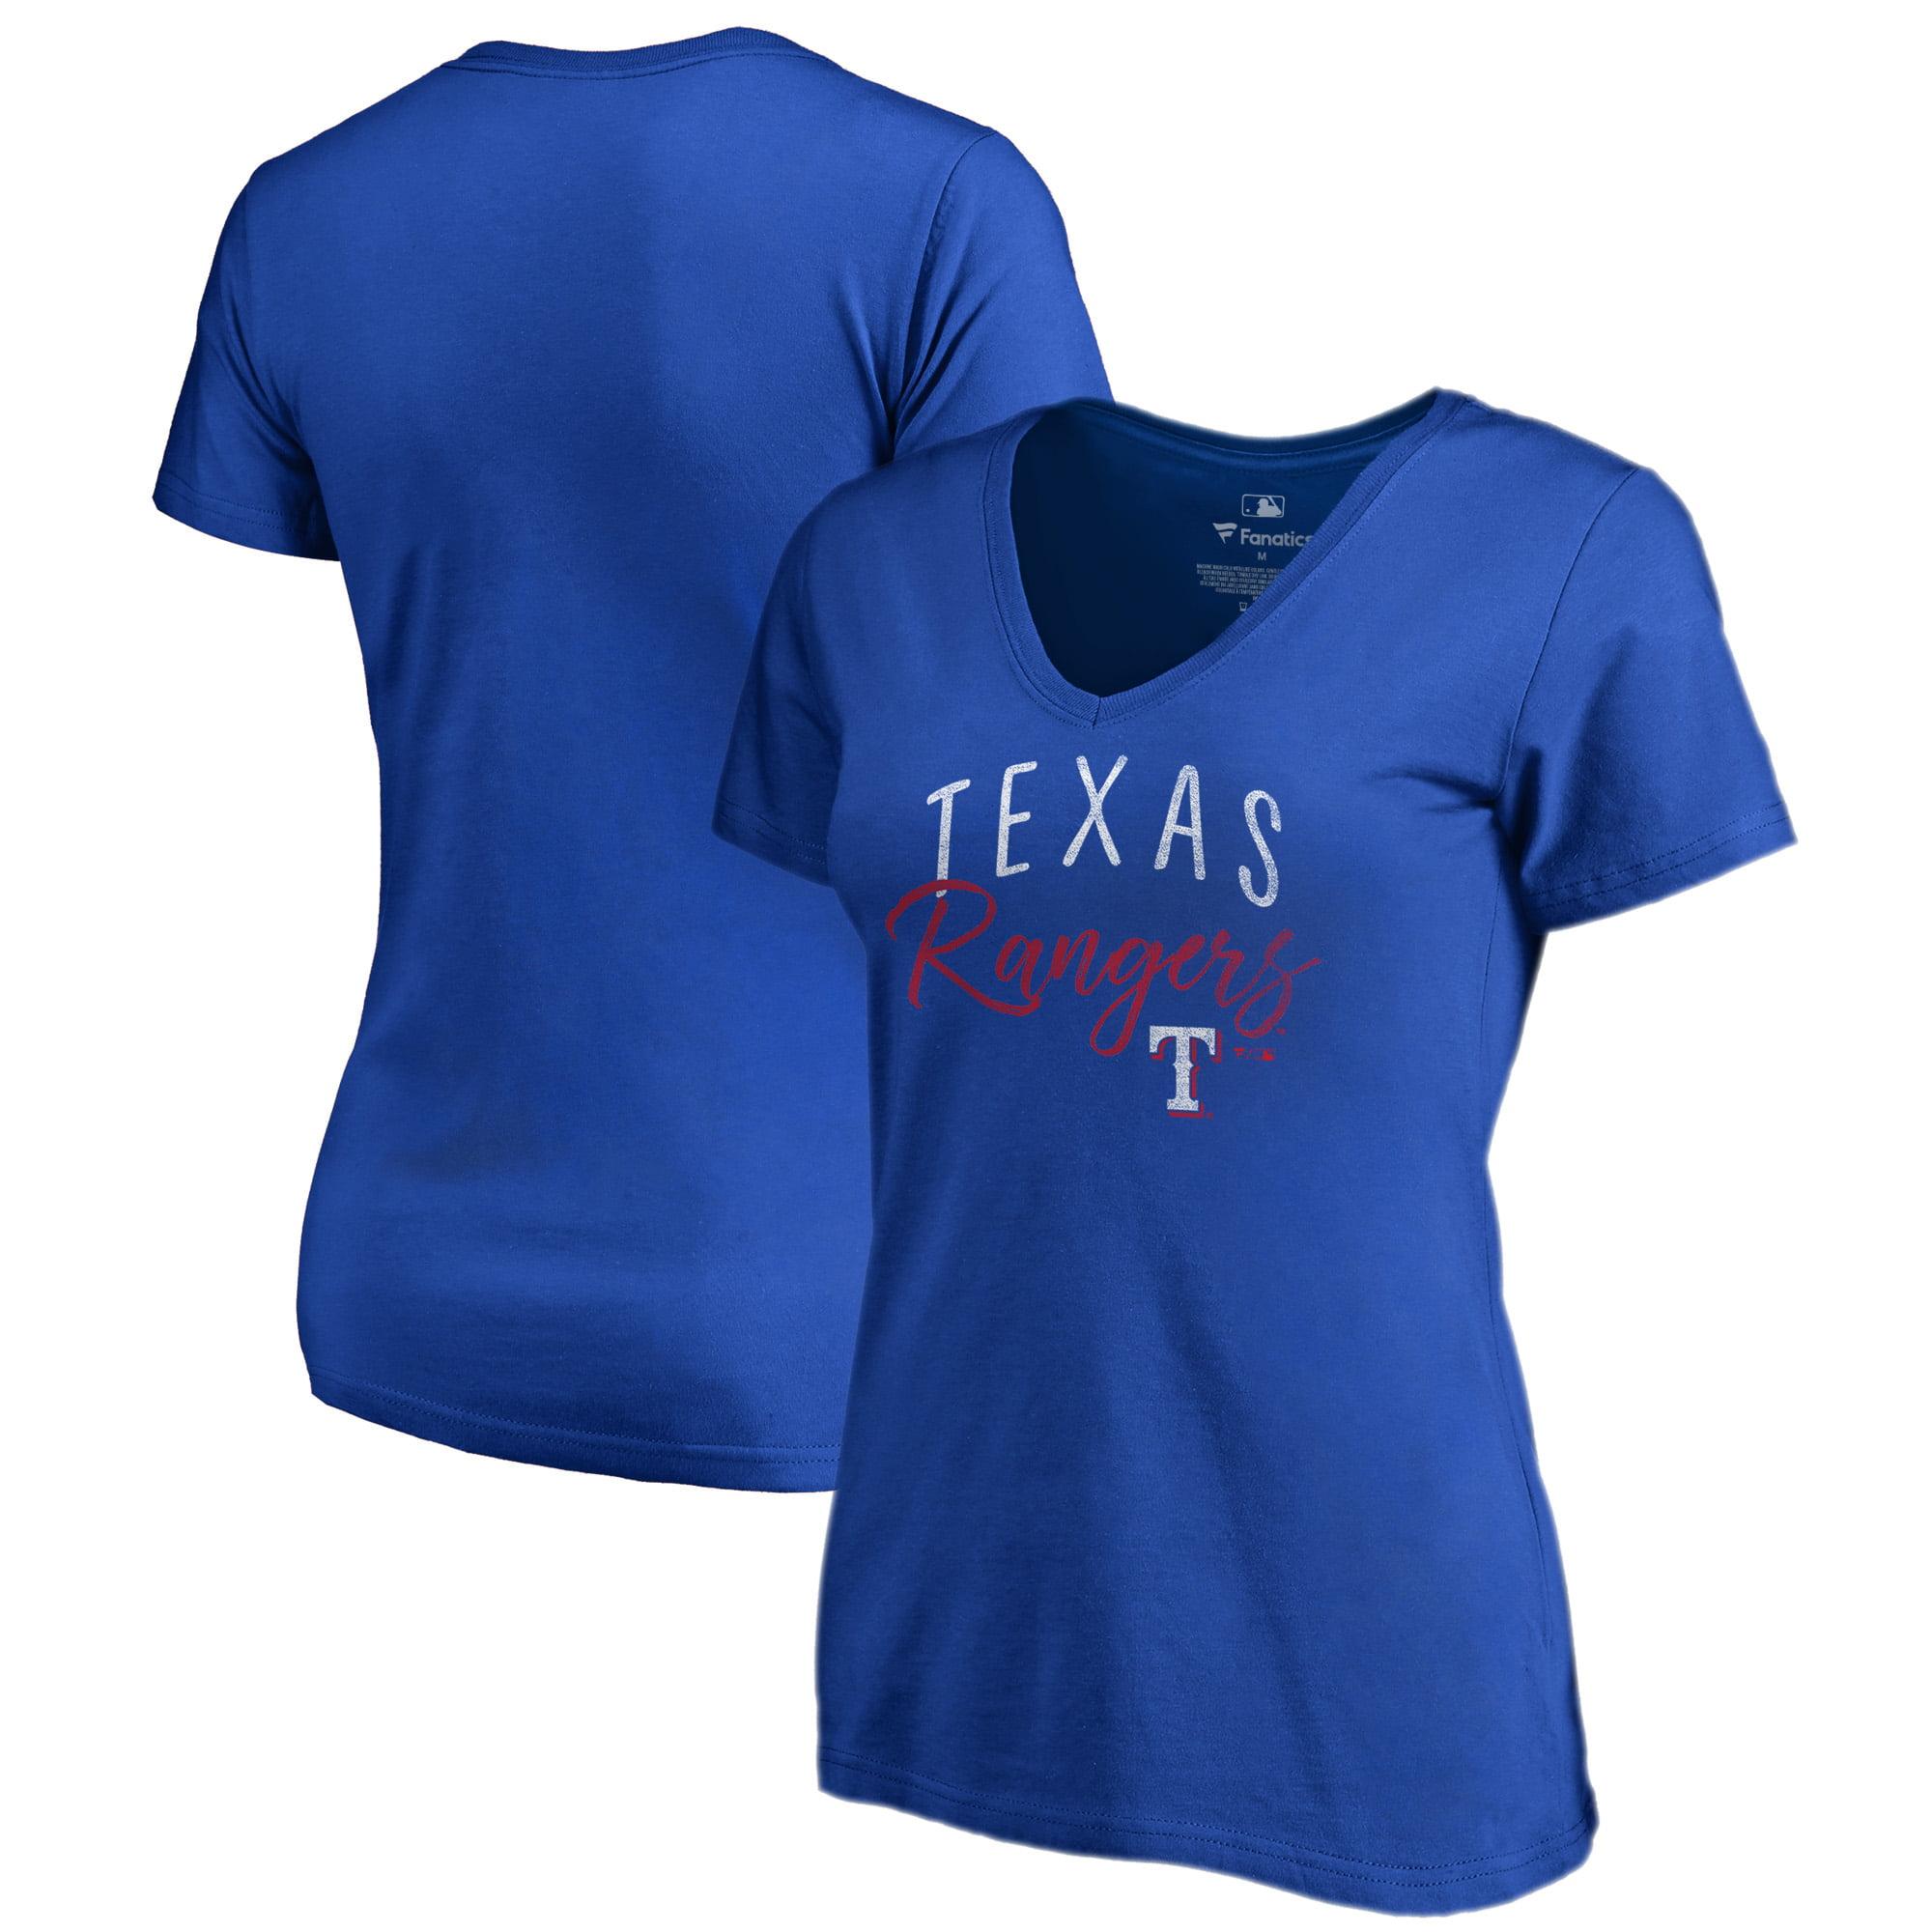 Texas Rangers Fanatics Branded Women's Plus Size Graceful V-Neck T-Shirt - Royal